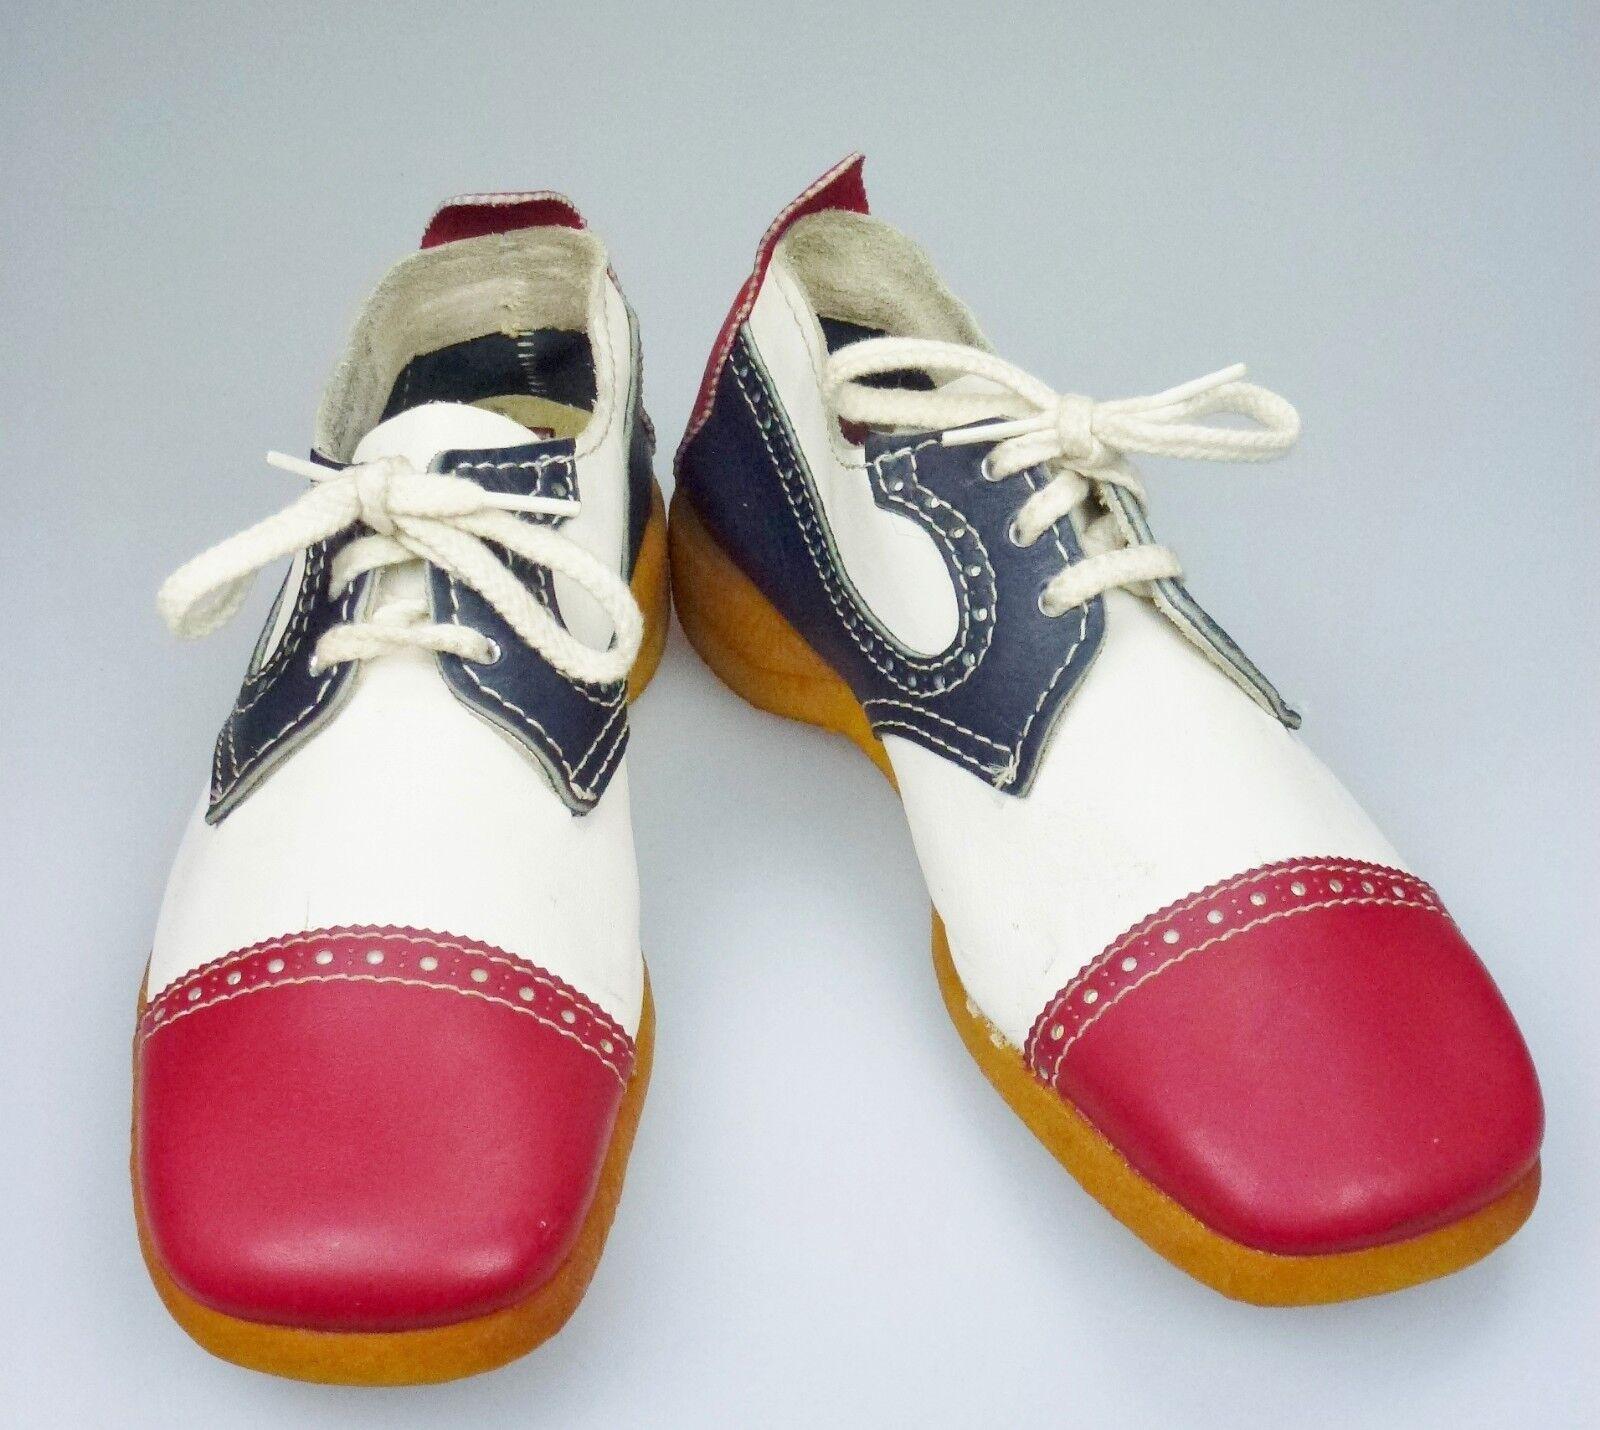 8.5M Road Runners Leder Schuhe ROT Costume Weiß Blau Lace Up Costume ROT Retro 02974d